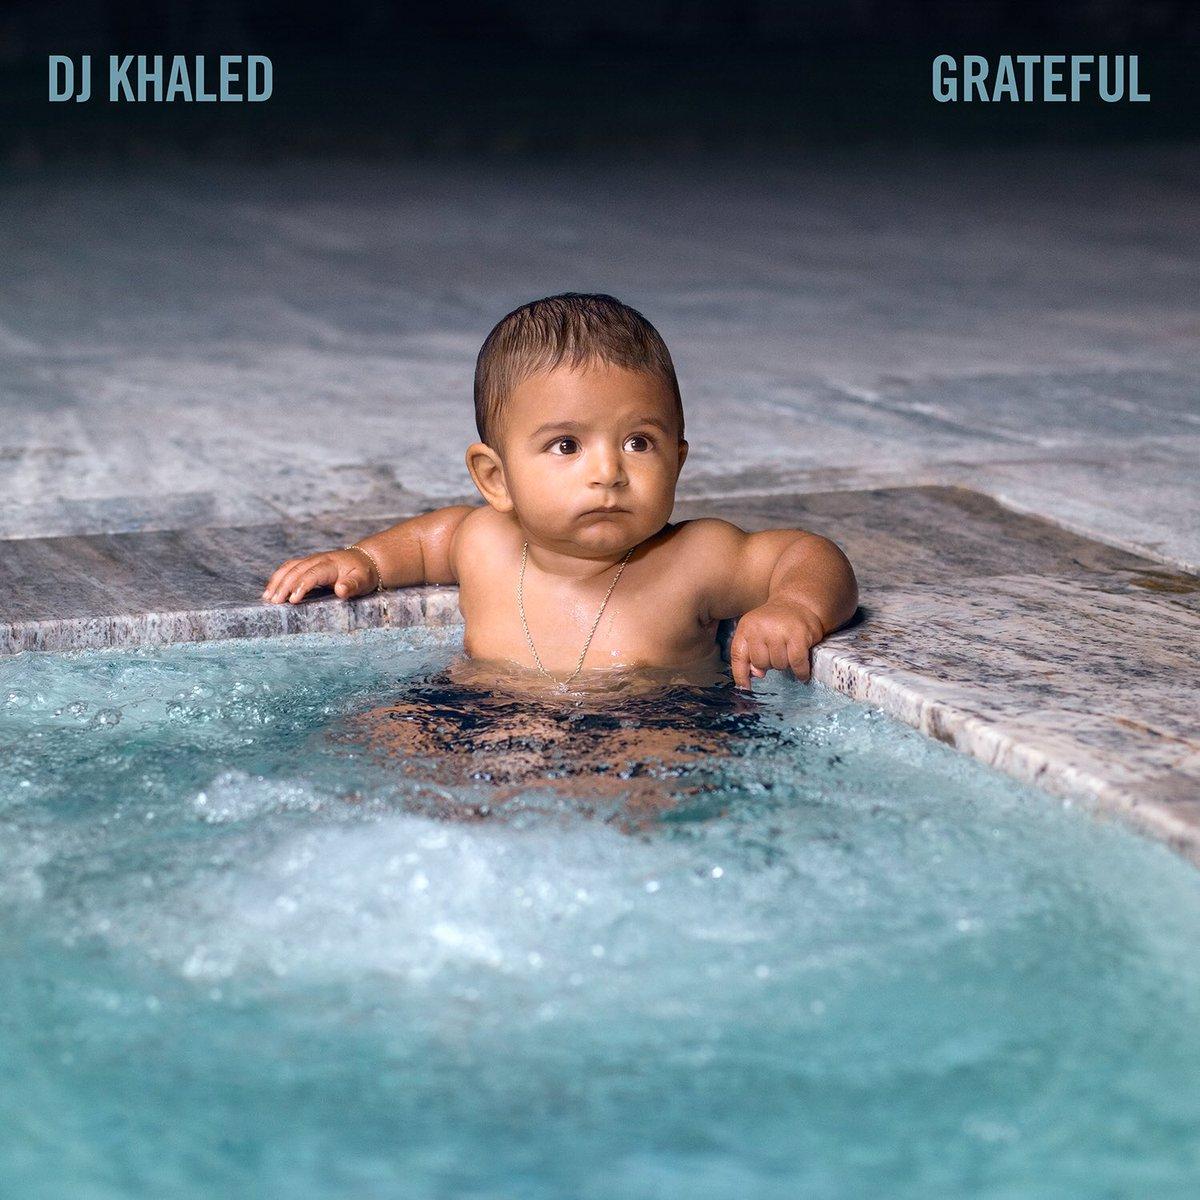 Grateful - DJ Khaled